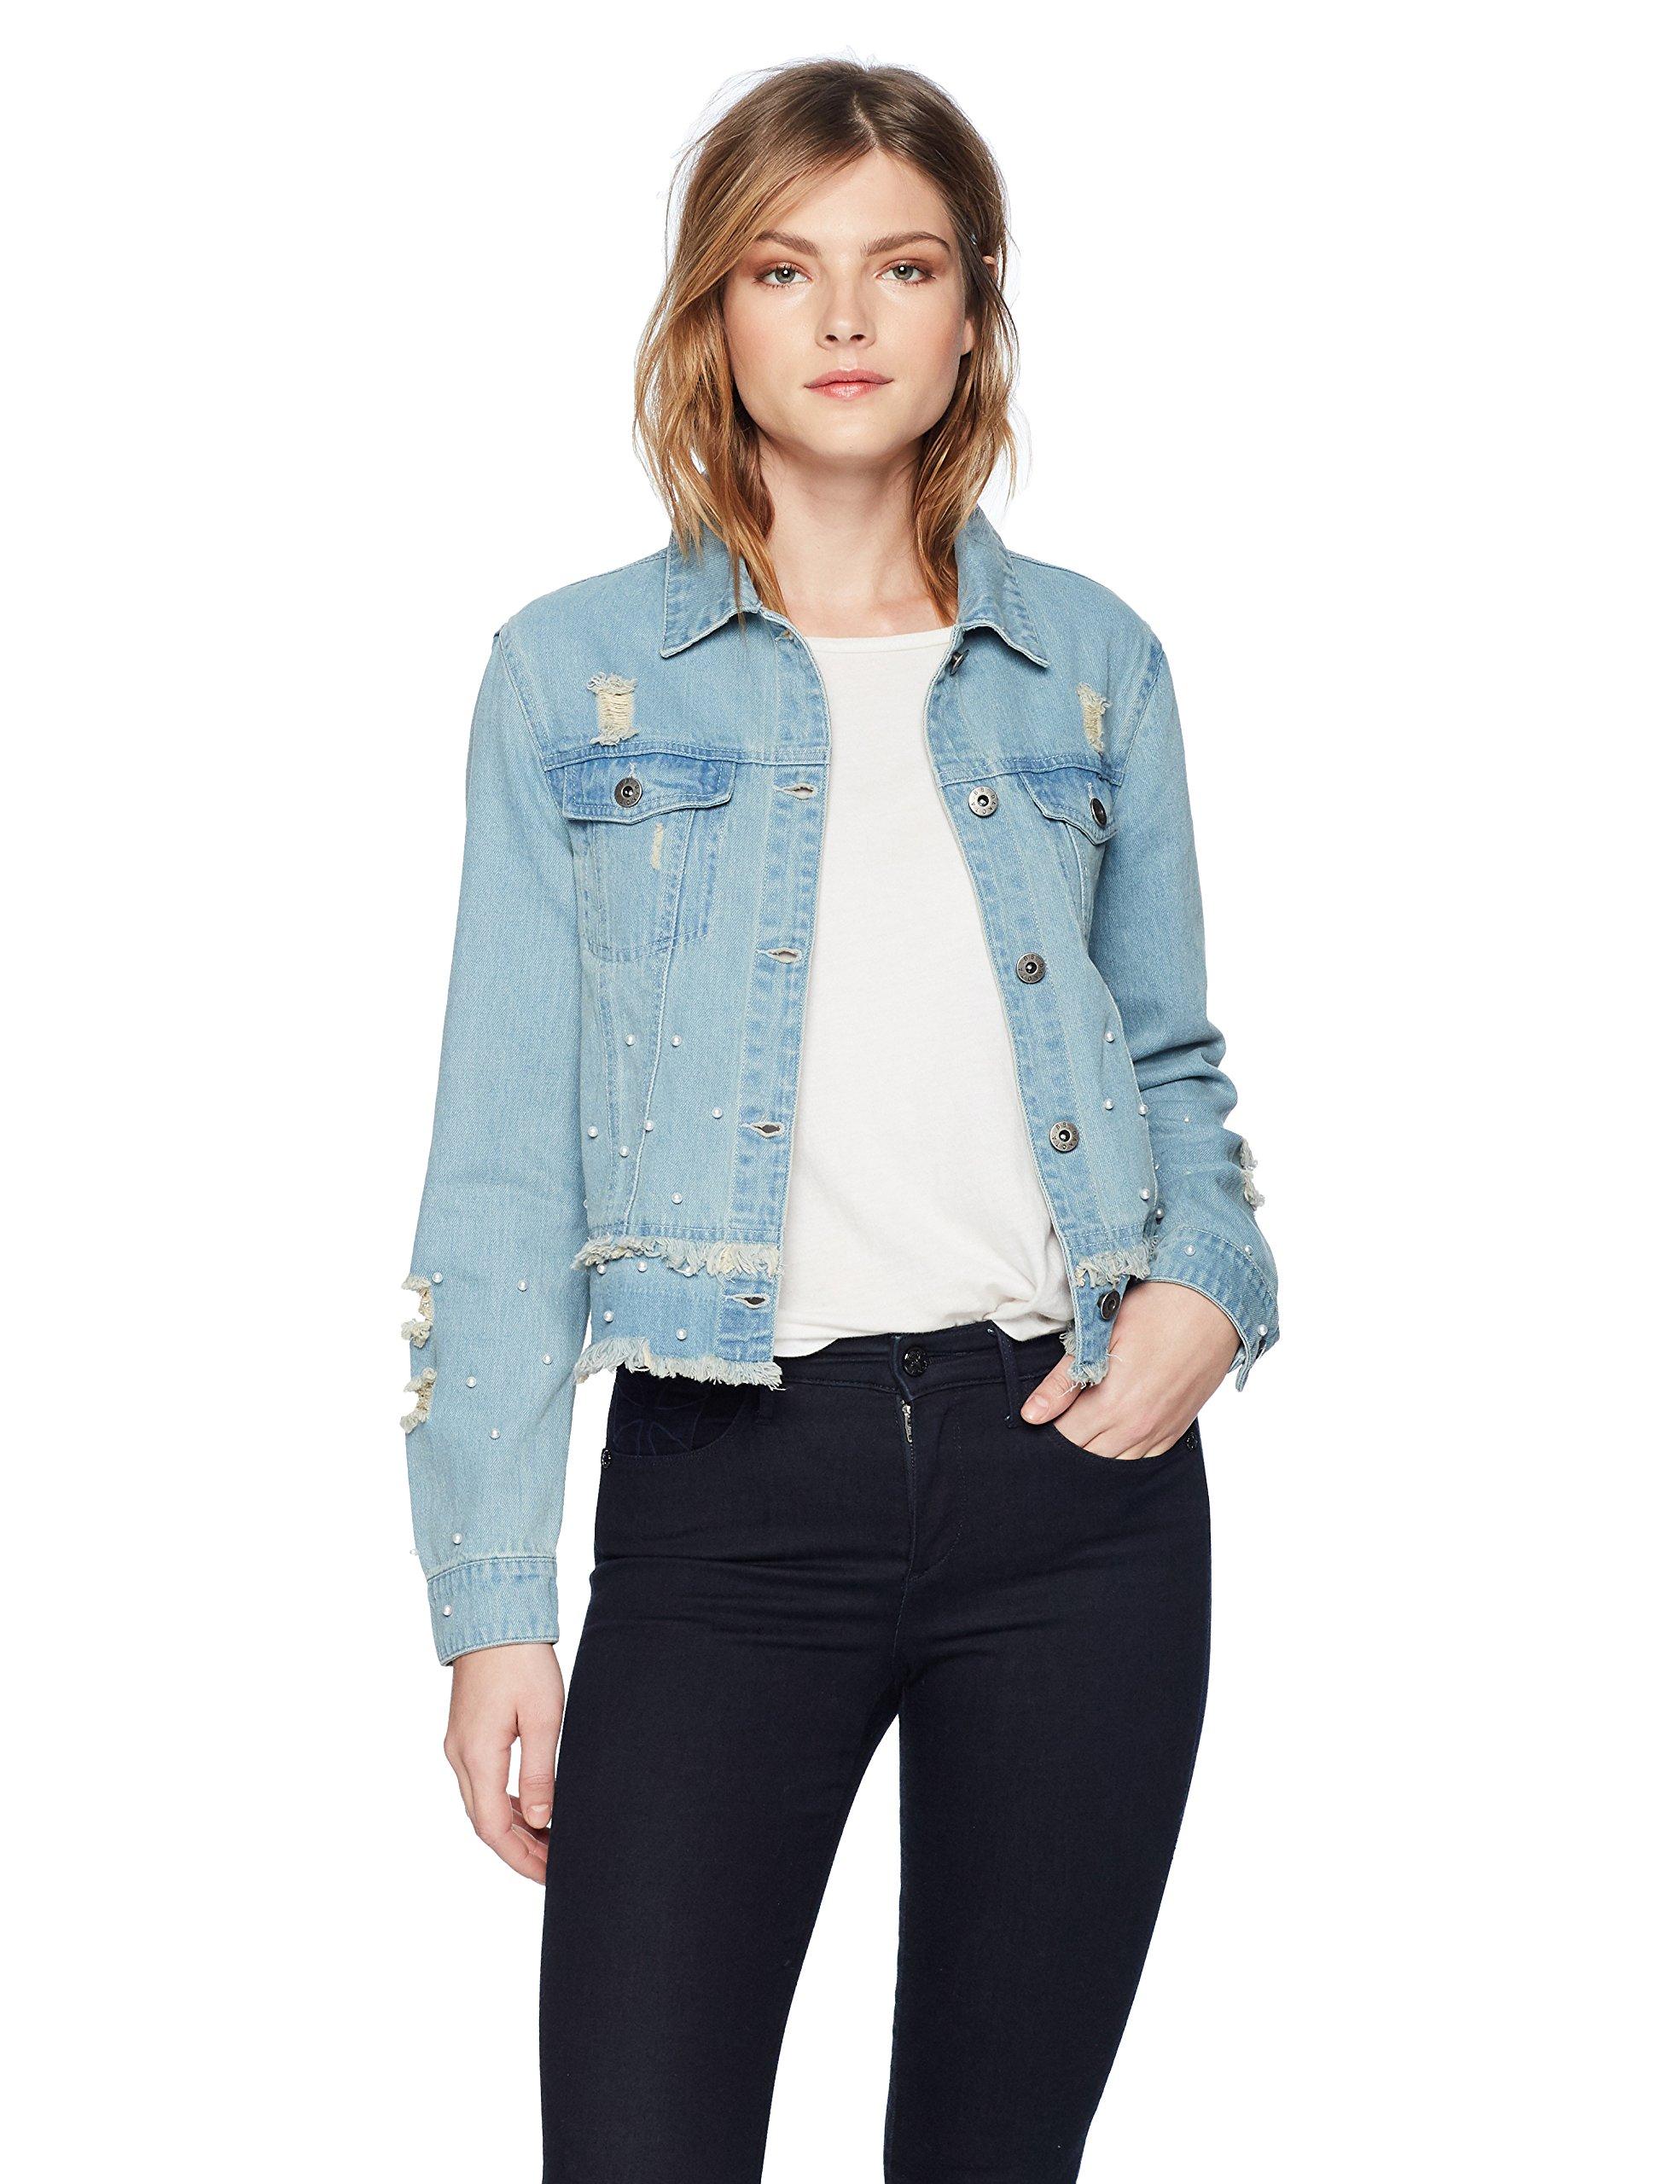 BB Dakota Women's Eisley Pearl Detailed Denim Jacket, Light Blue, Medium